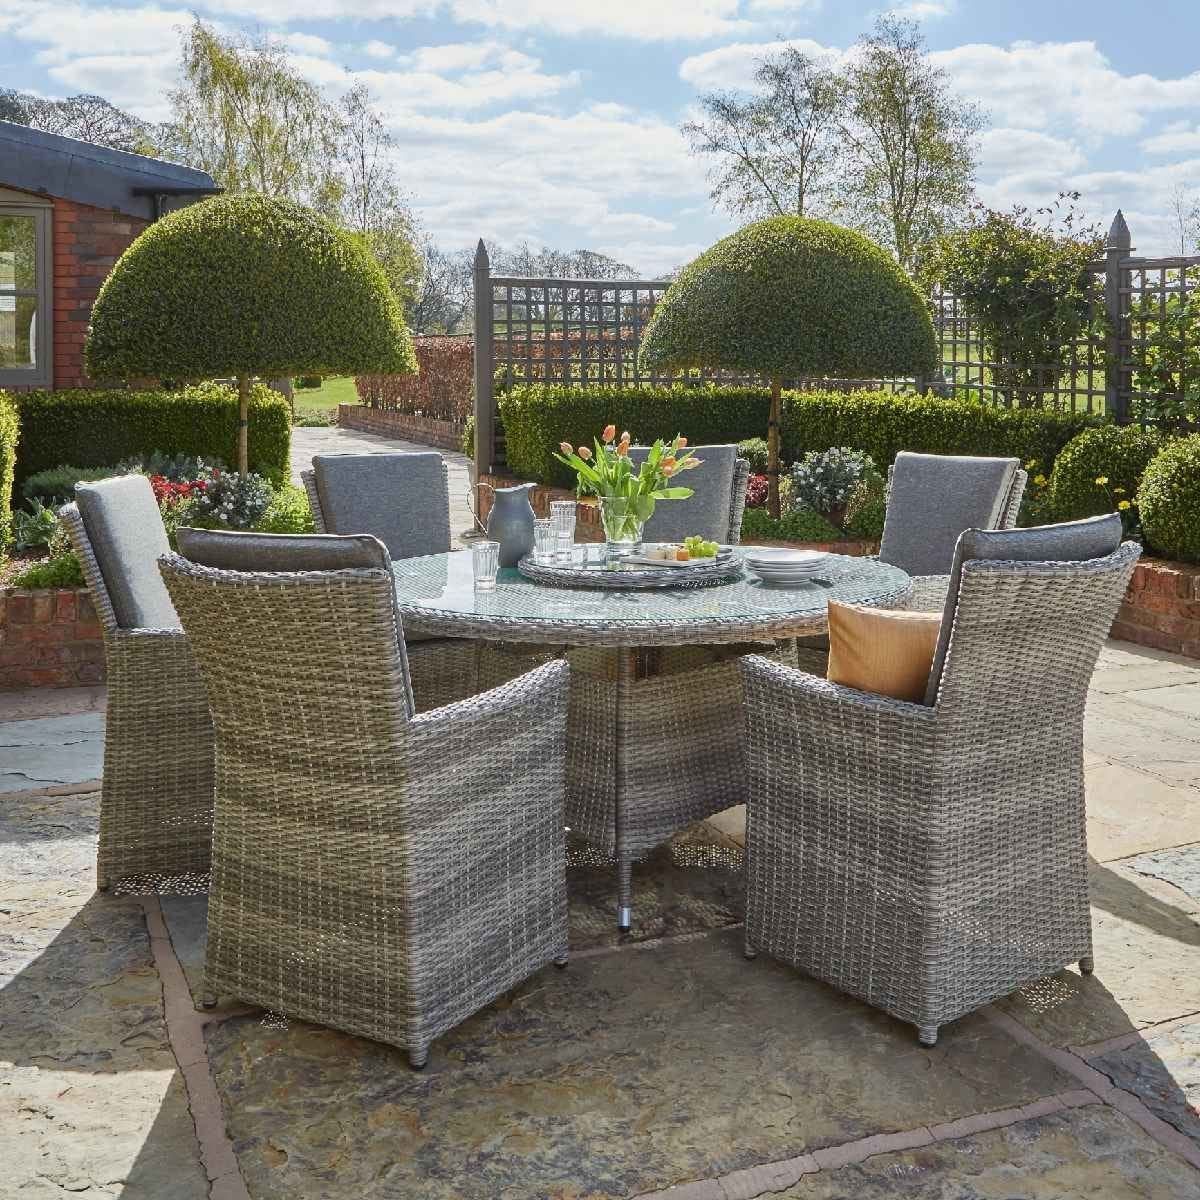 Handpicked Burnham XL 6 Seat Dining Set - Grey